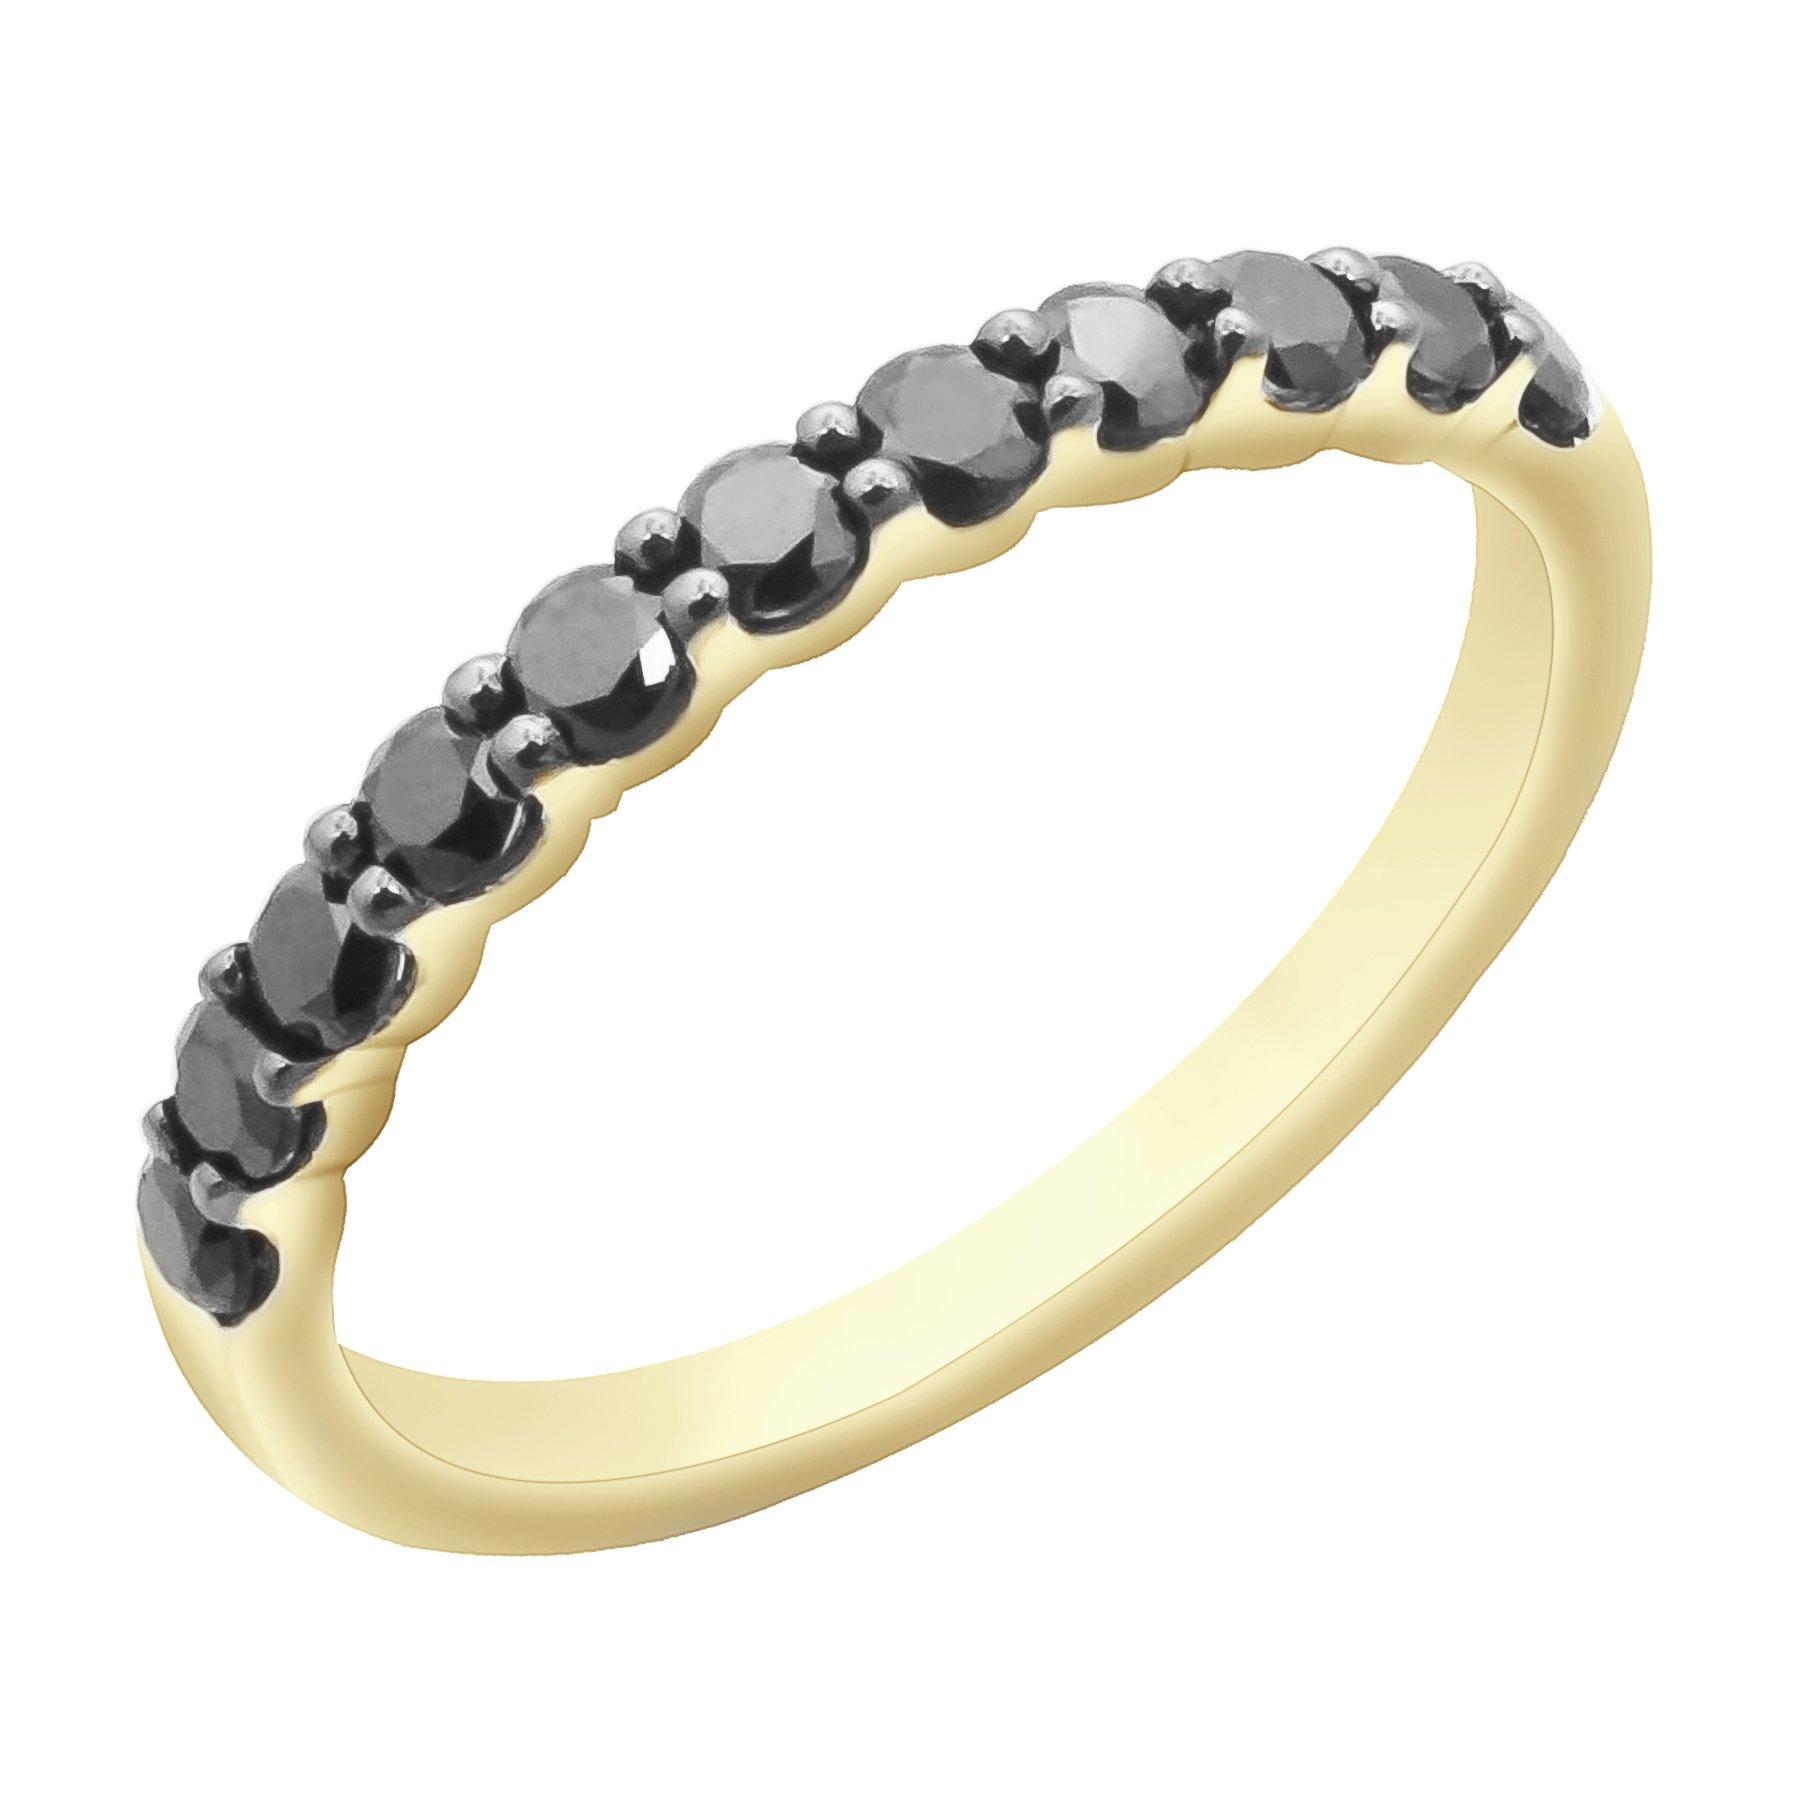 Prism Jewel 0.50 Carat Prong Set Round Black Diamond Wedding Band, 14k Yellow Gold, Size 8